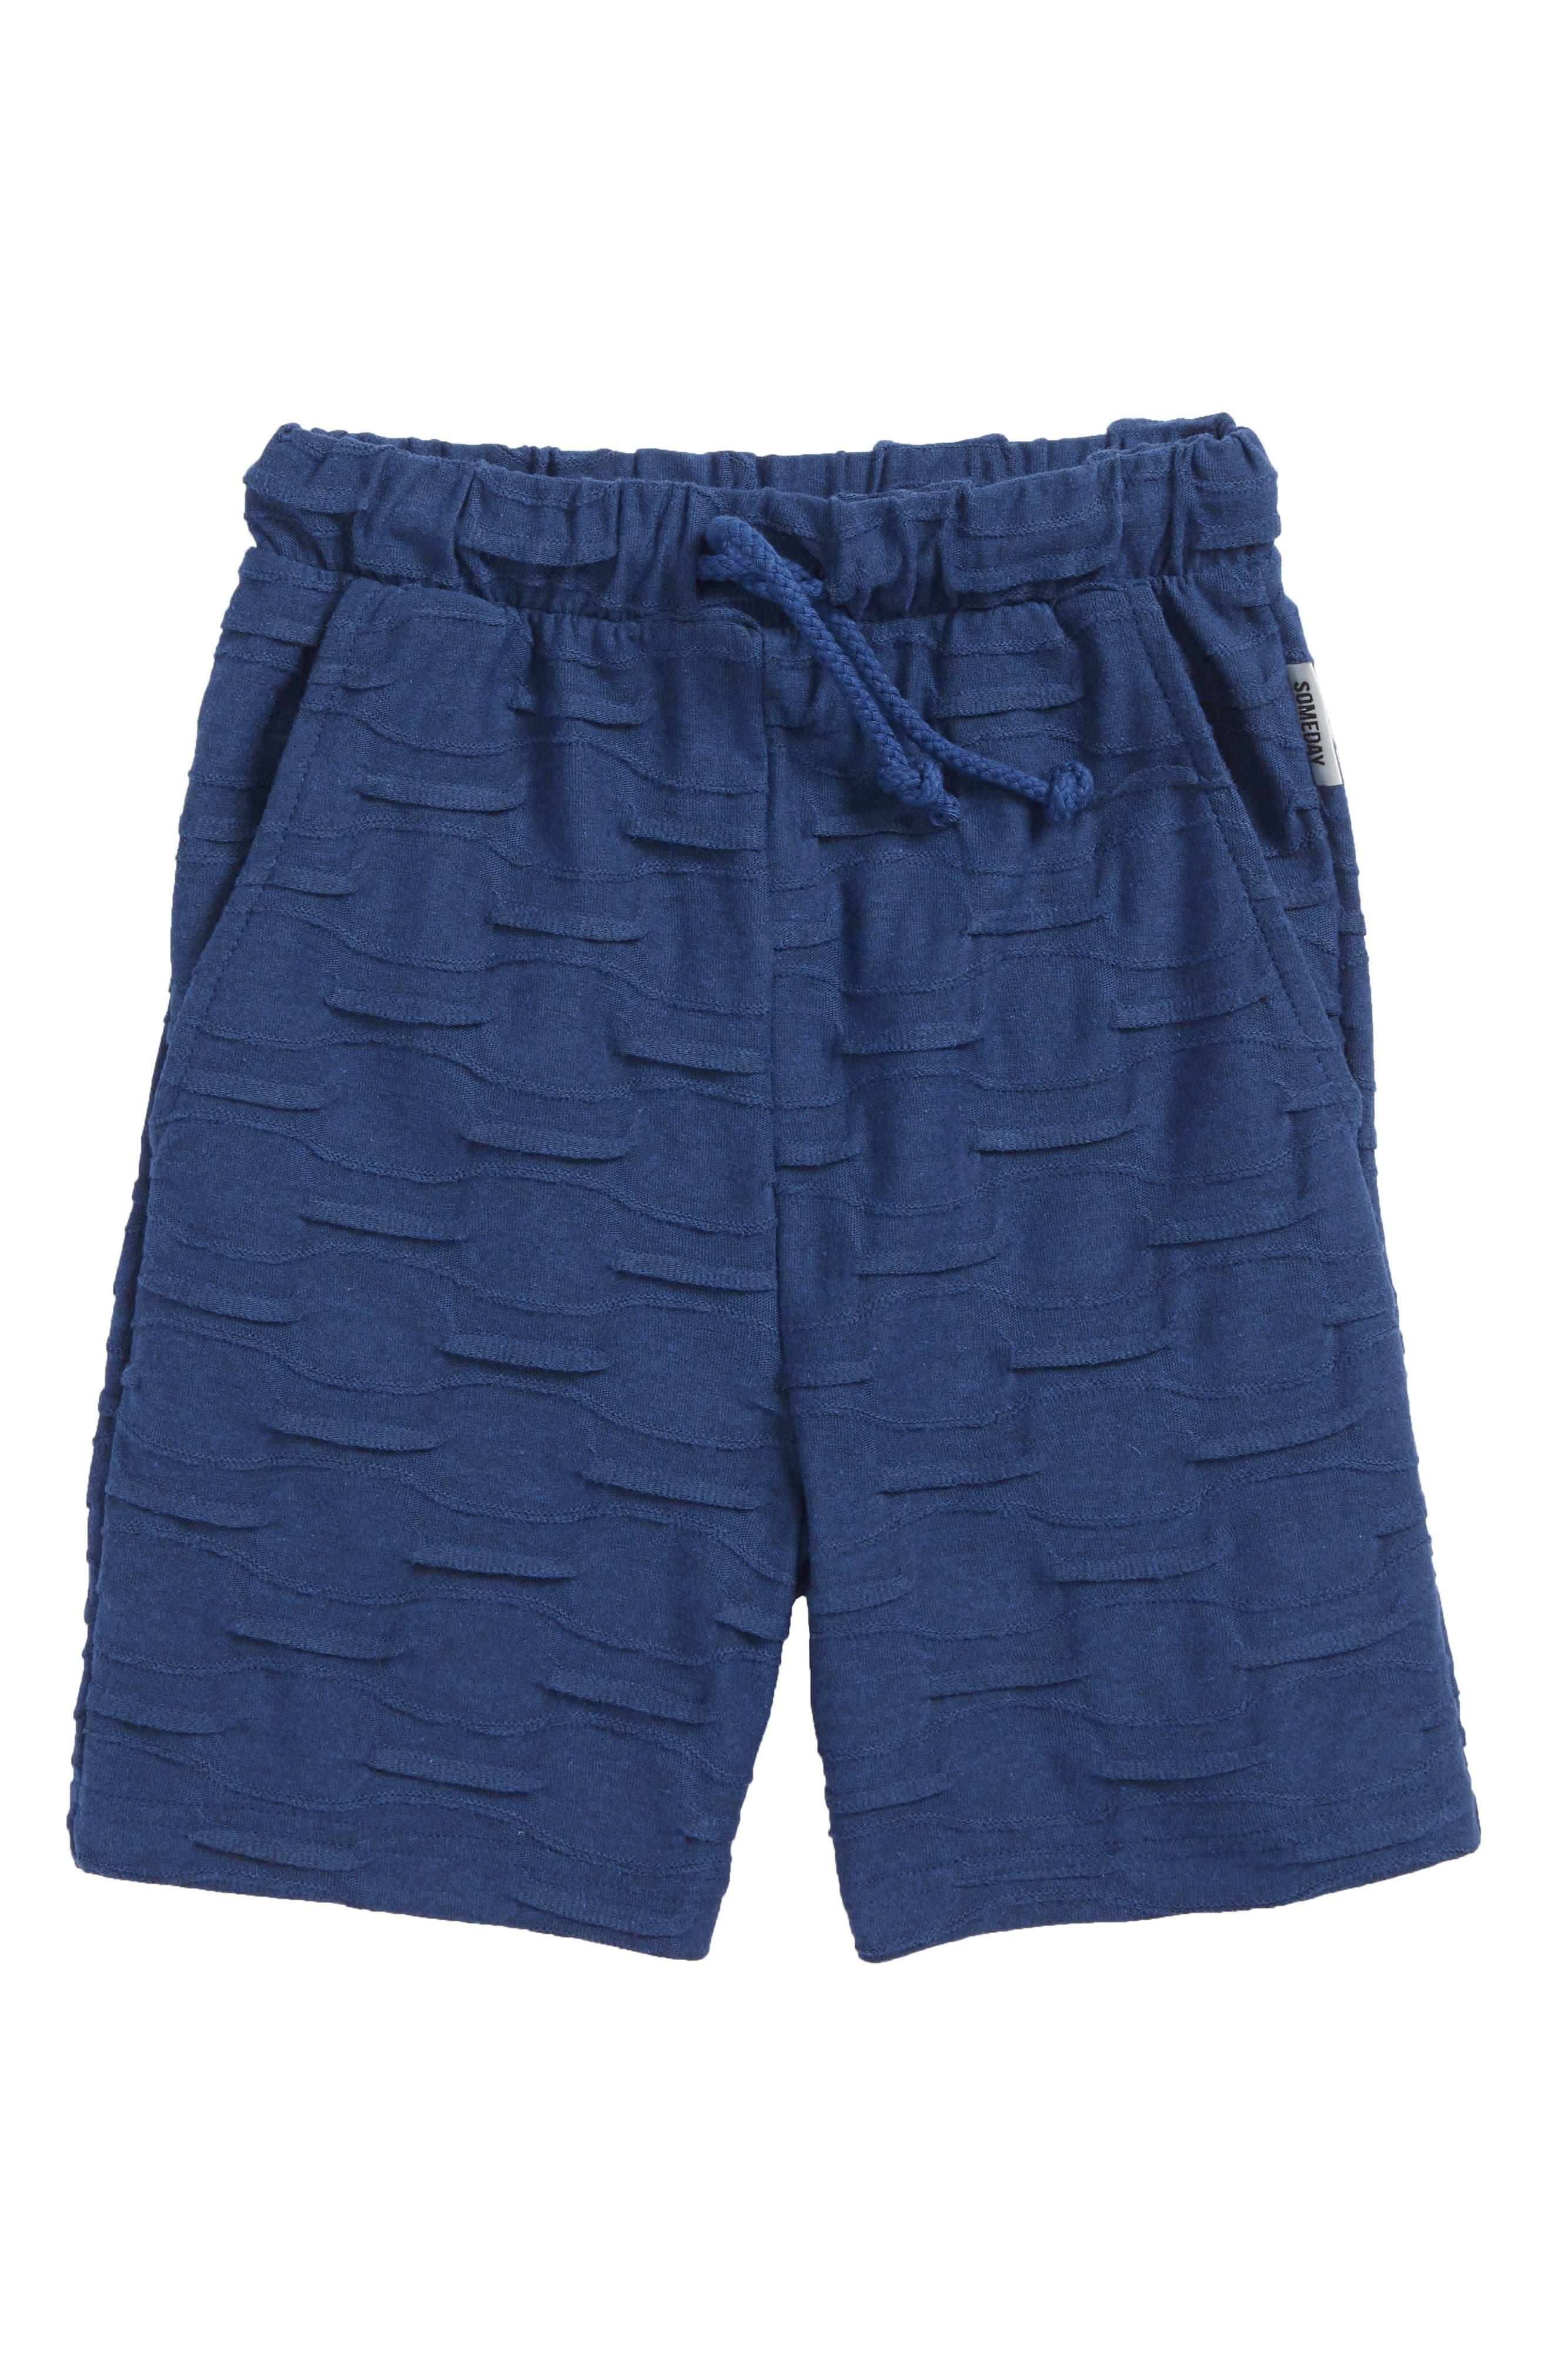 Cambria Shorts,                         Main,                         color,